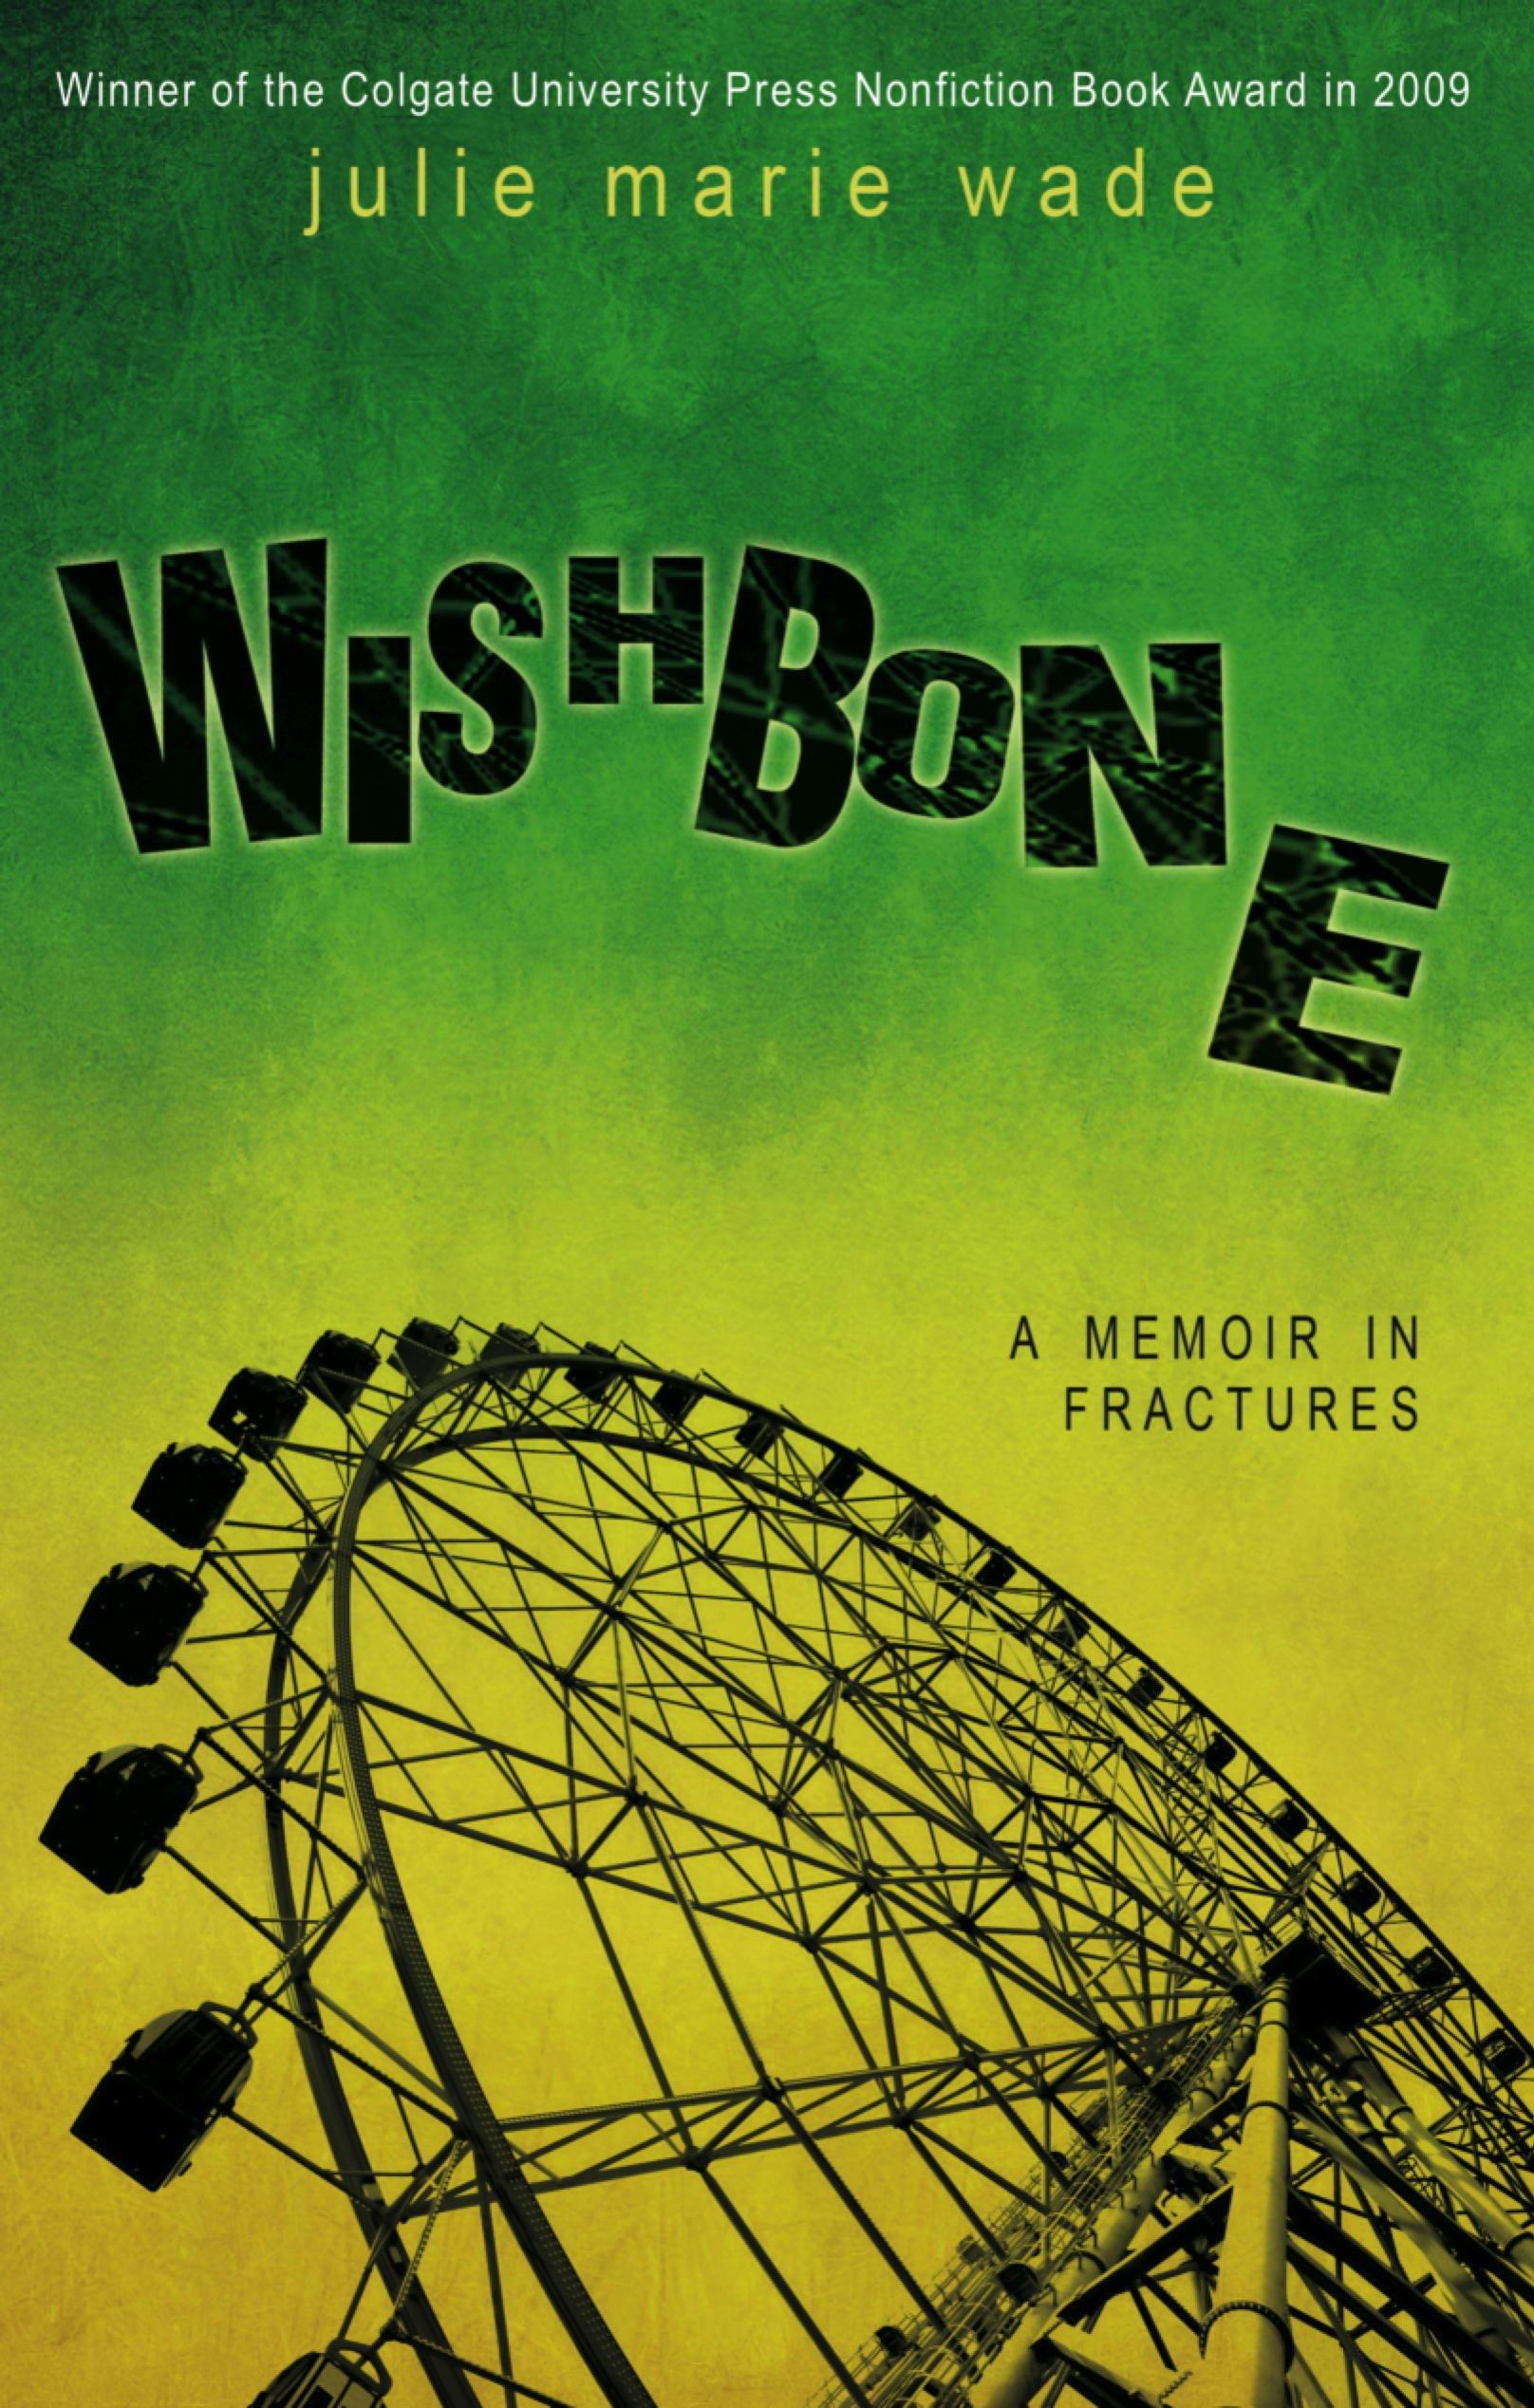 Amazon.com: Wishbone: A Memoir in Fractures (9781612940557): Julie Marie  Wade: Books